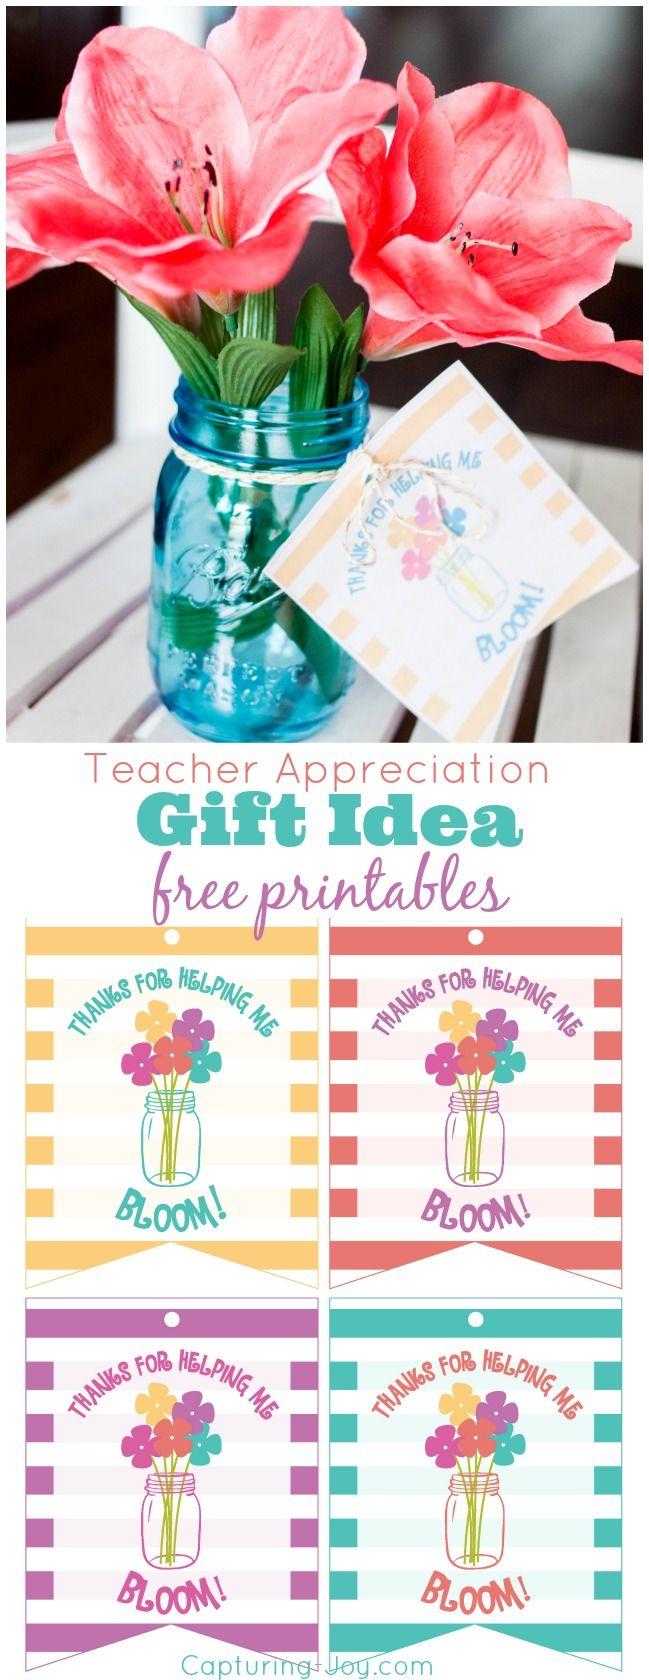 Teacher Appreciation Gift Idea Free Printables #teacher #gift